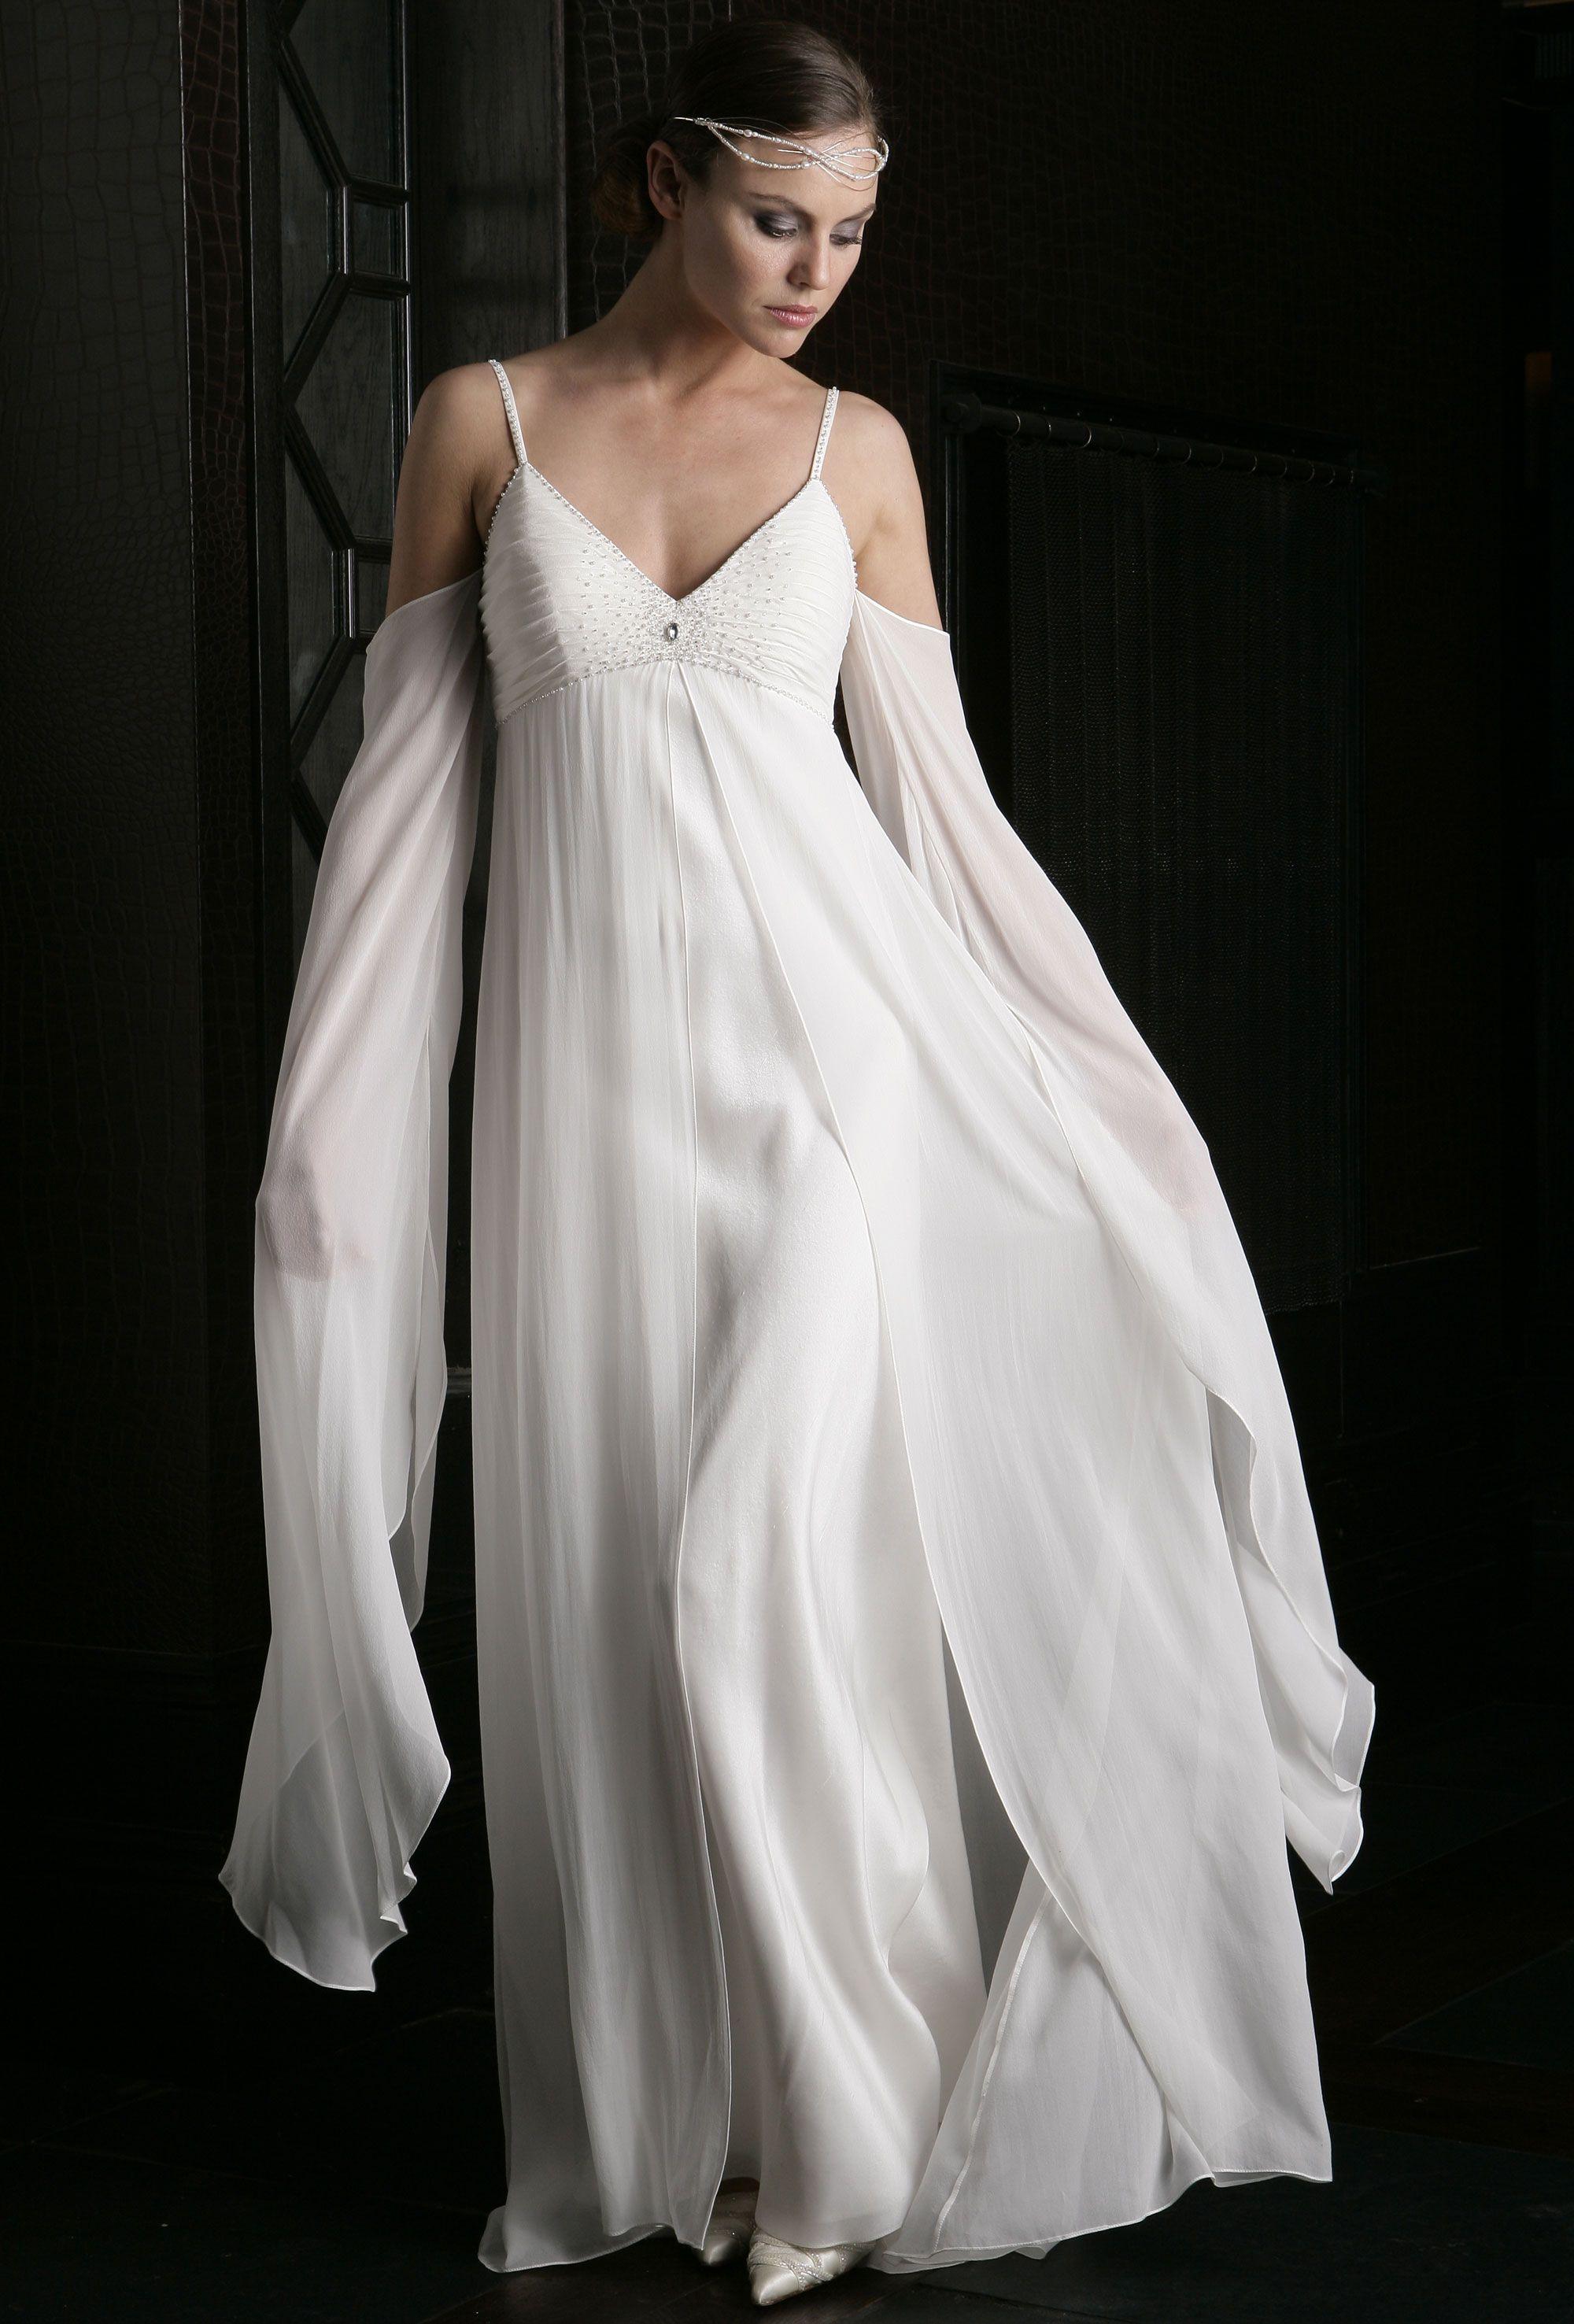 Gabriella wedding dress. Grecian or medieval maiden a very romantic ...